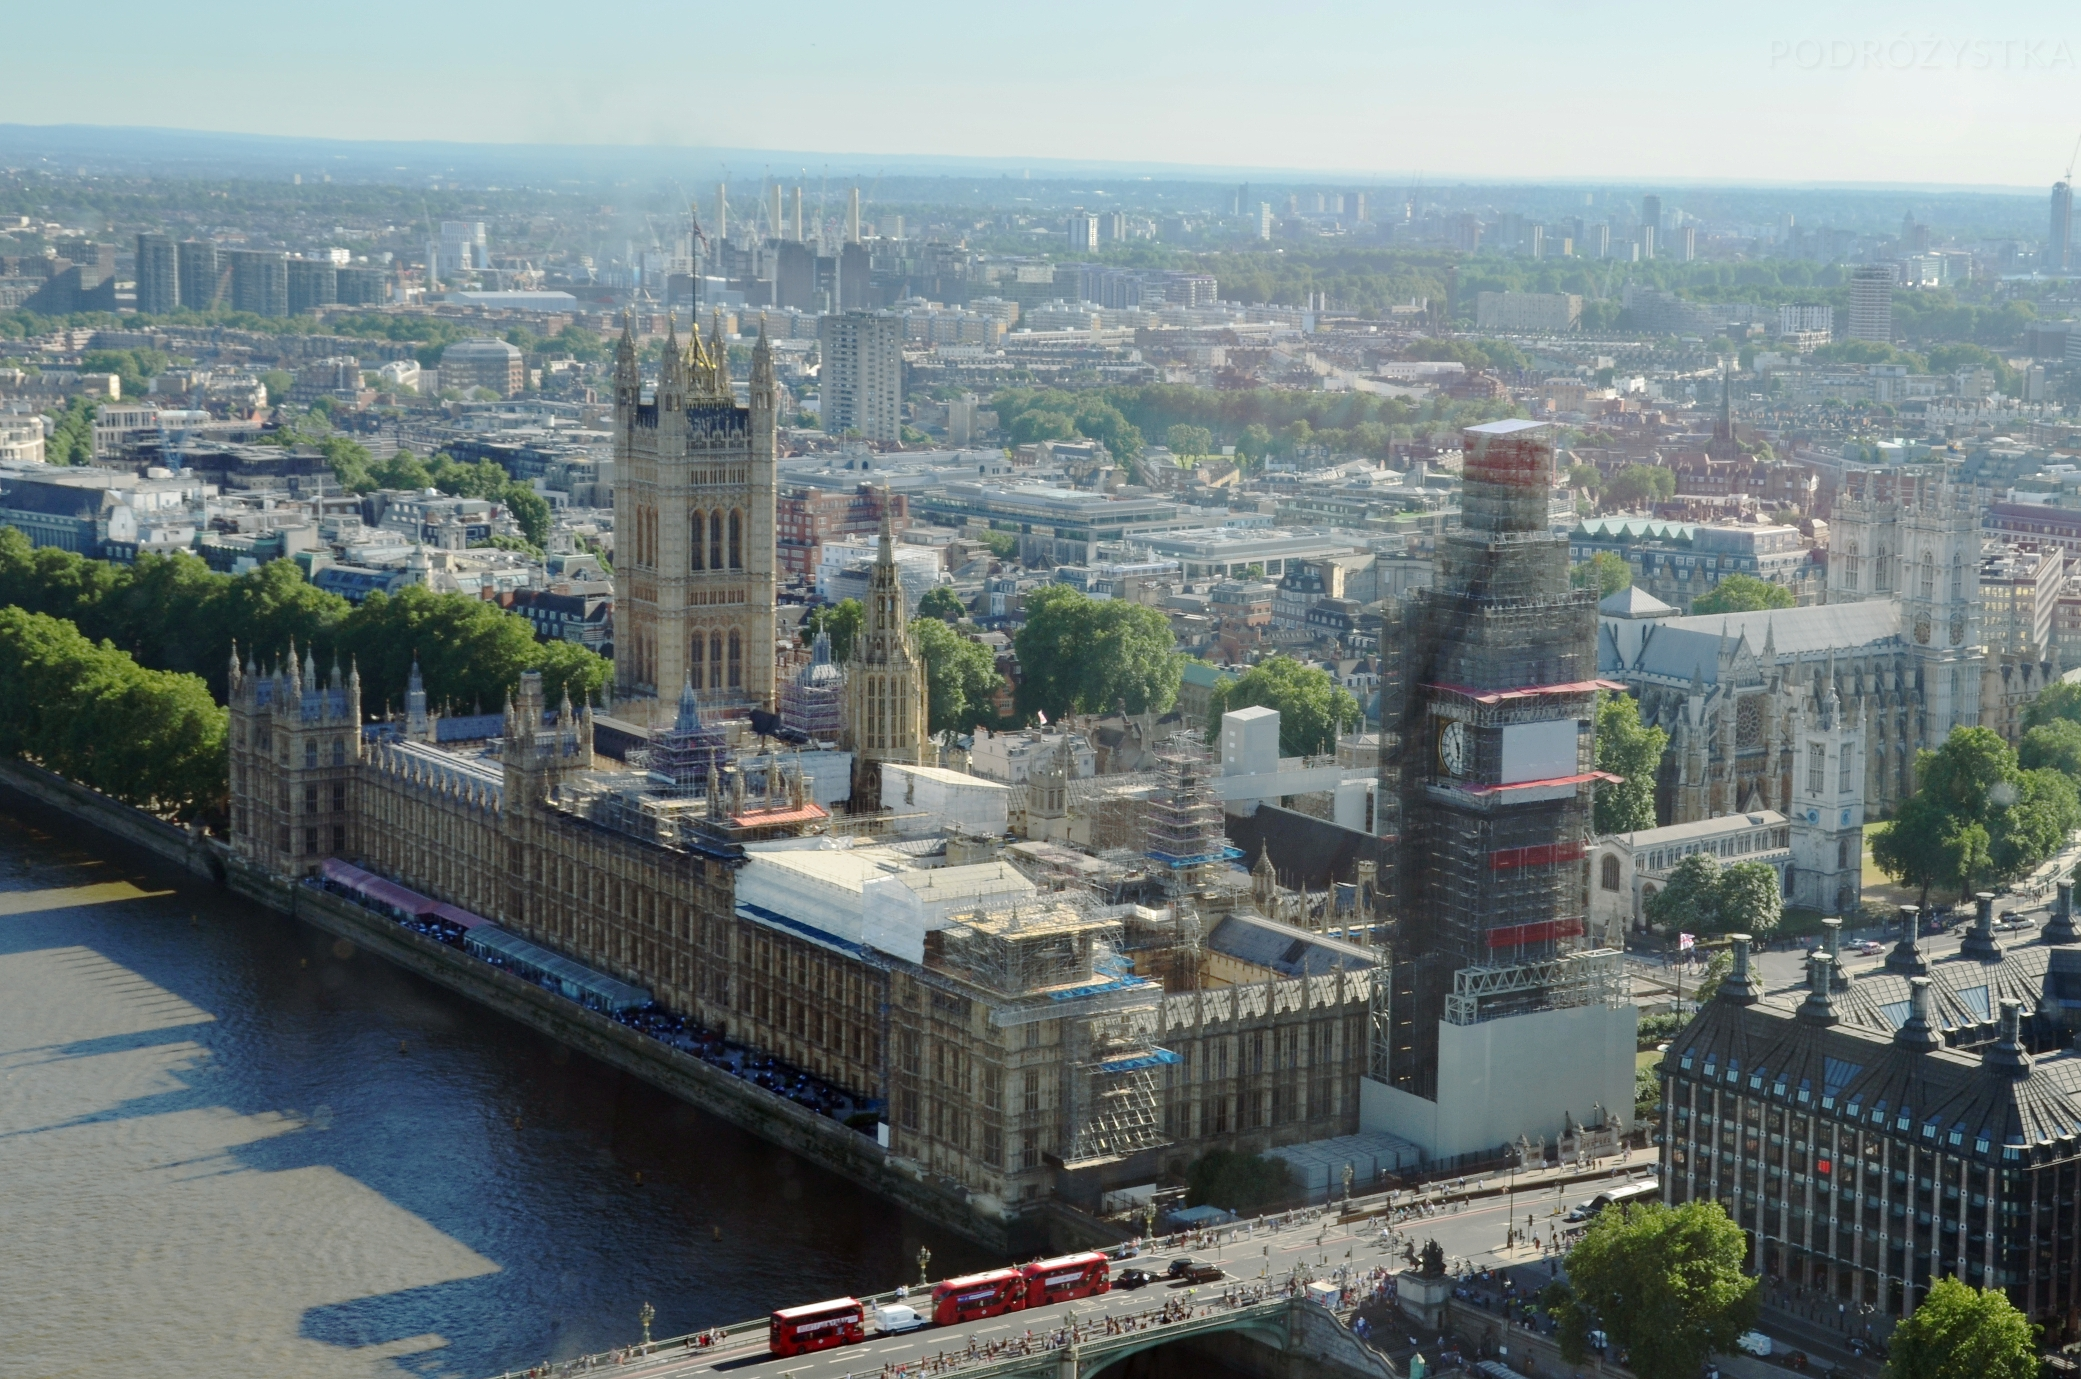 UK_III_17_London_Eye_Palace_of_Westminster_50_size_watermark